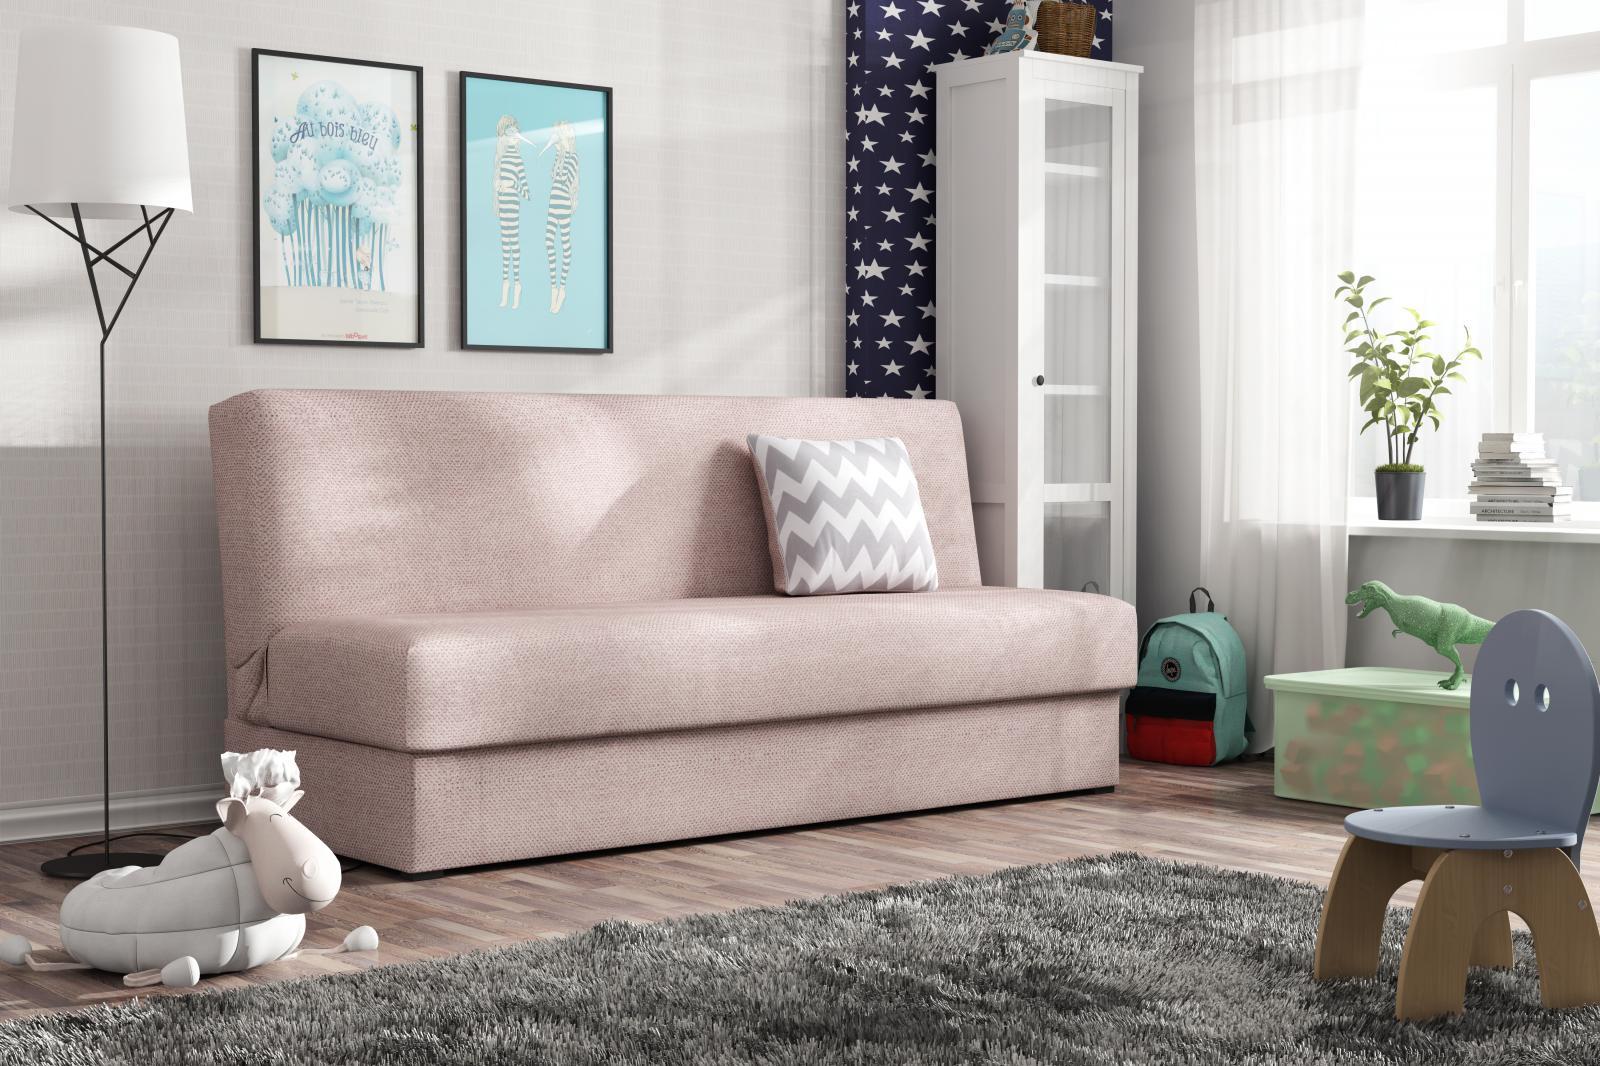 Pohovka Deli Mini růžová